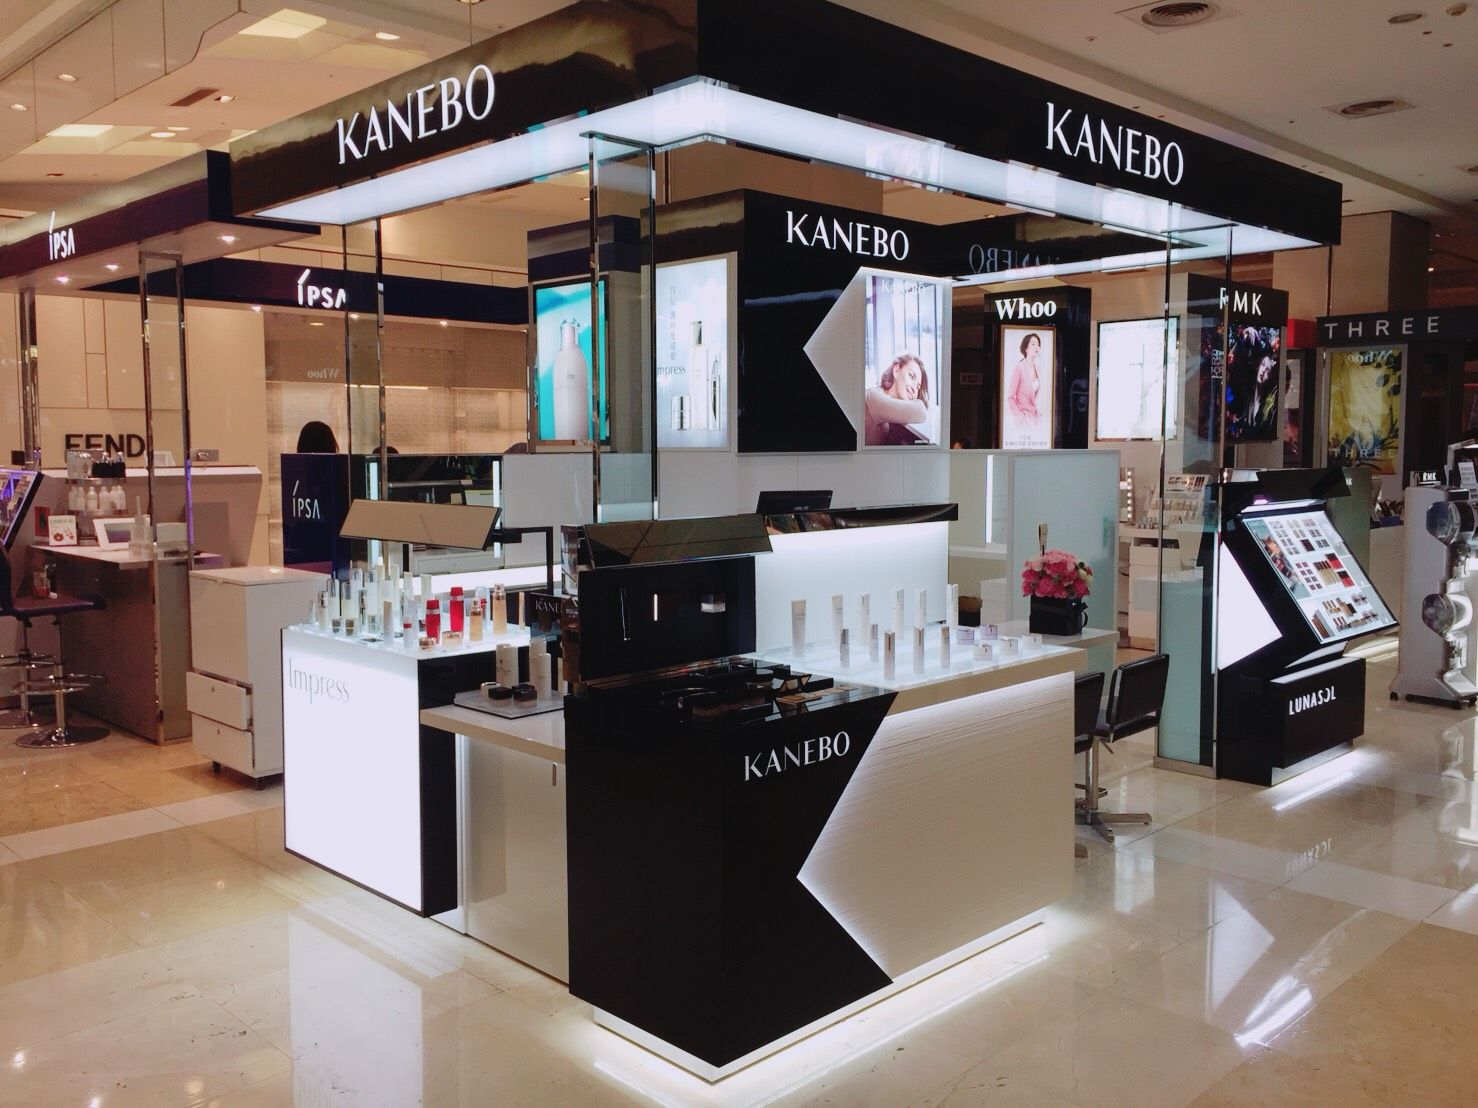 Kanebo首間概念櫃插旗台中新光三越!時尚與經典完美交織,打造頂級消費體驗